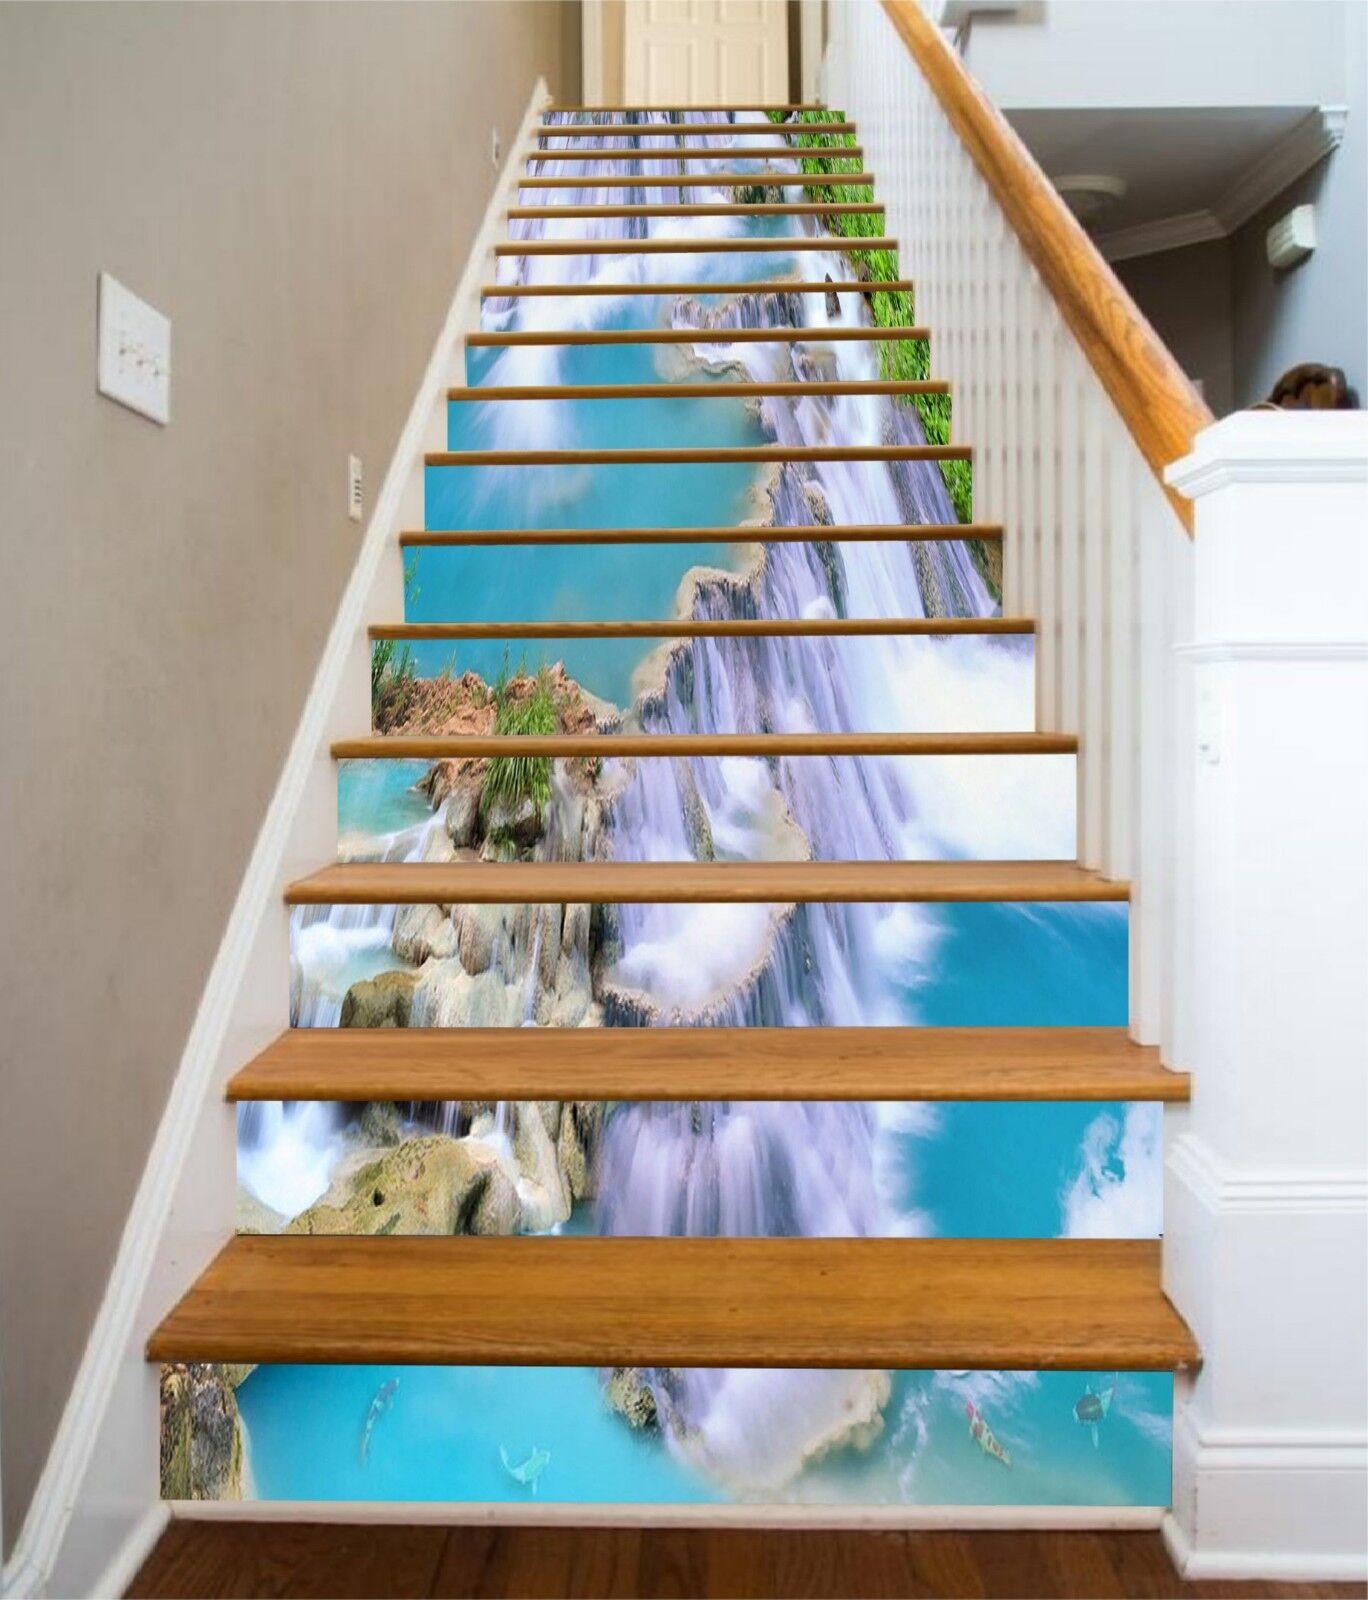 3D Wasserfall 1912 Stair Risers Dekoration Fototapete Vinyl Aufkleber Tapete DE